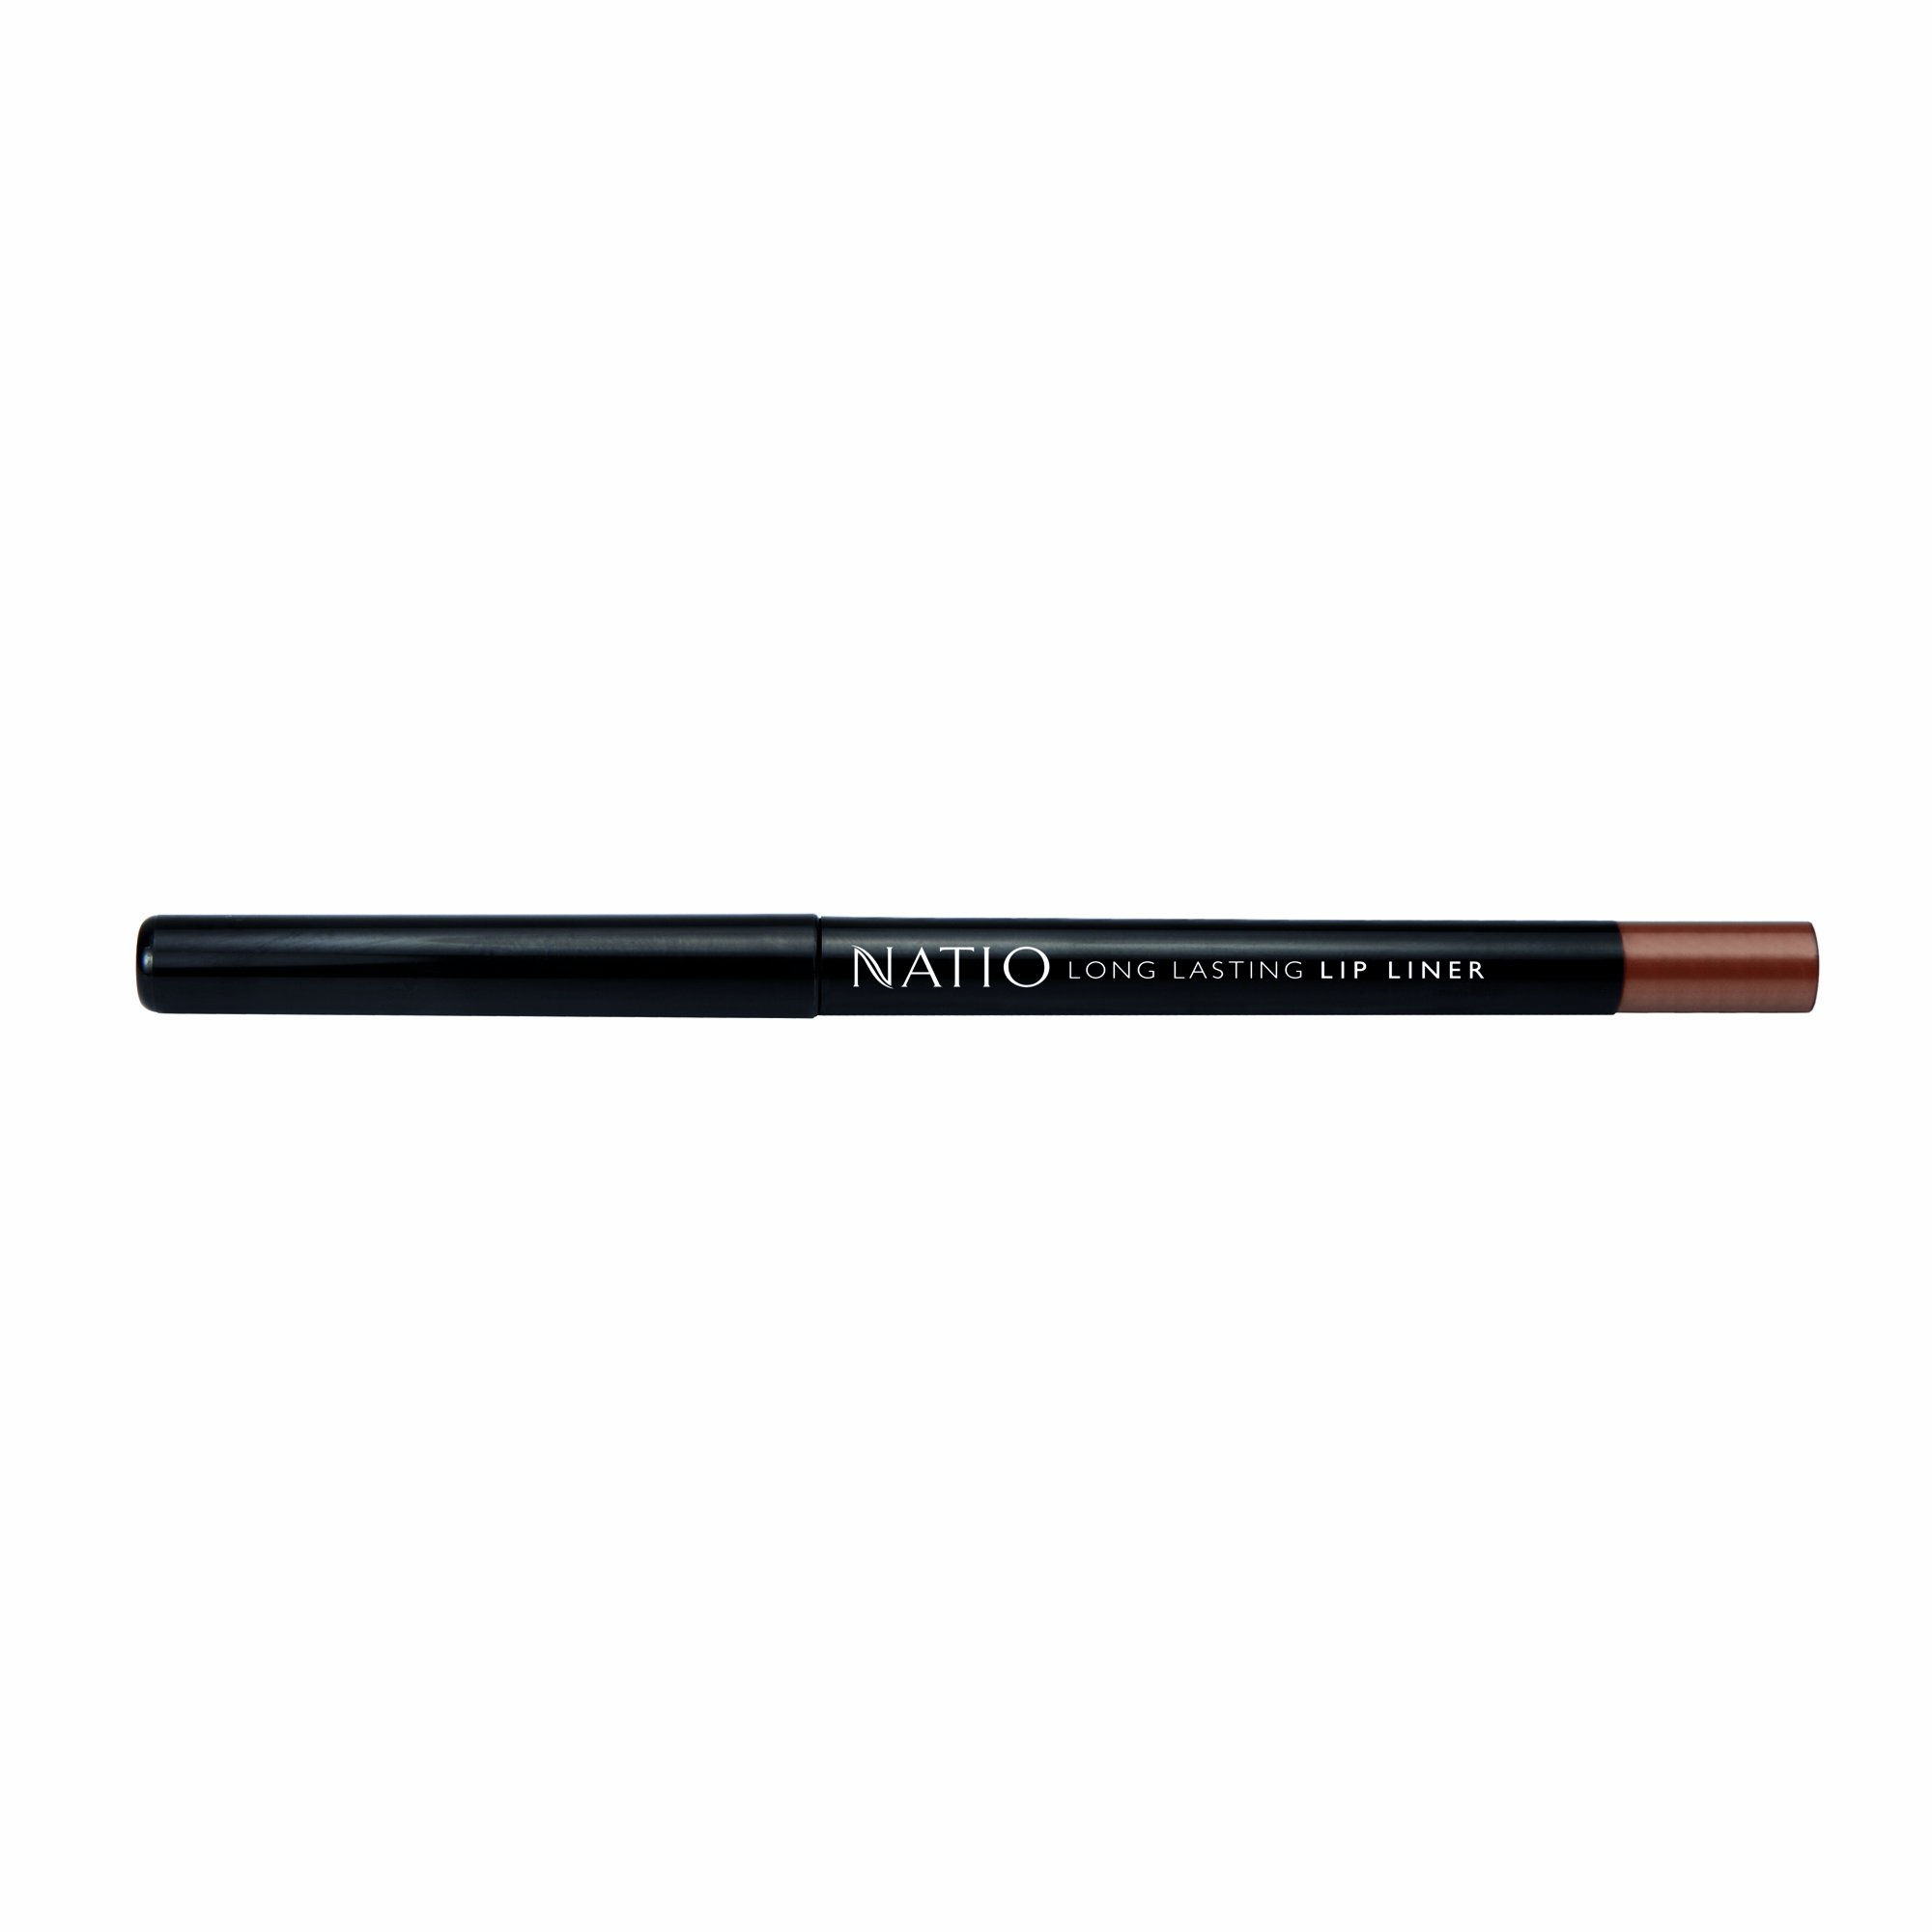 Natio Mechanical Long Lasting Lip Liner -Nude